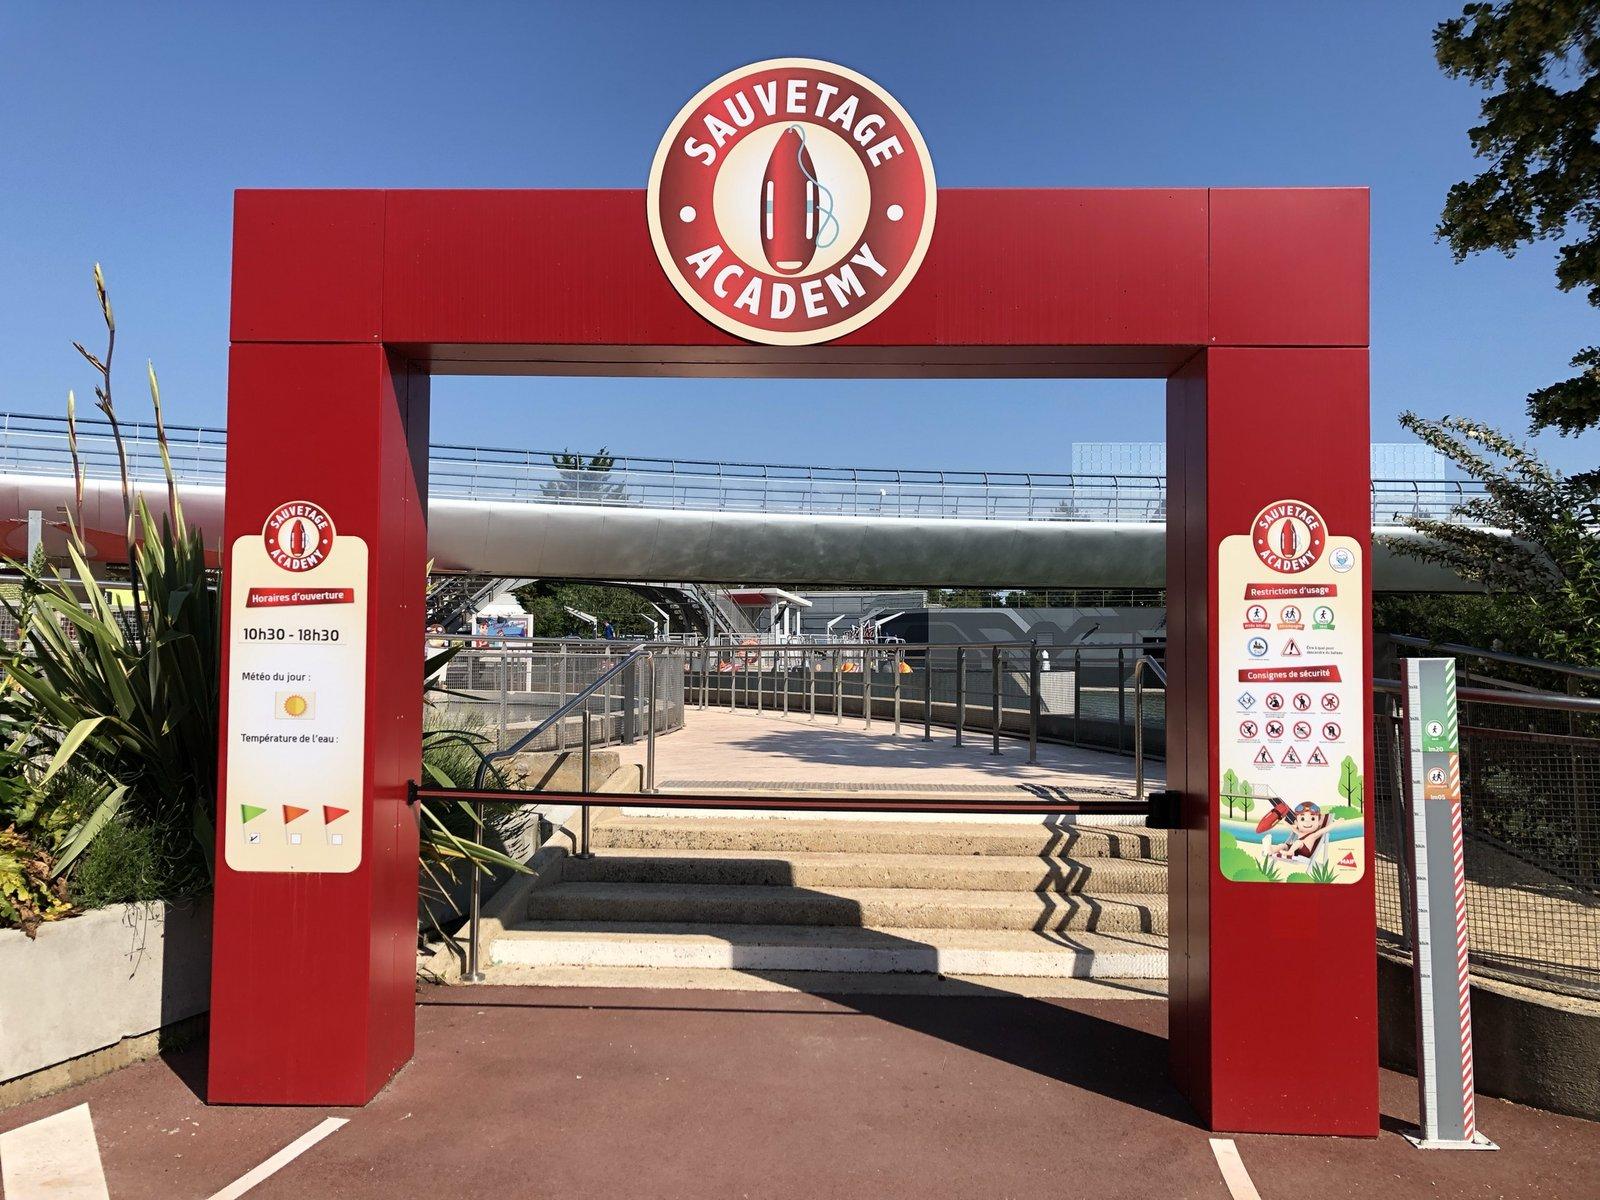 Sauvetage Academy · 2019 Futuropolis-Sauvetage-Academy-arche